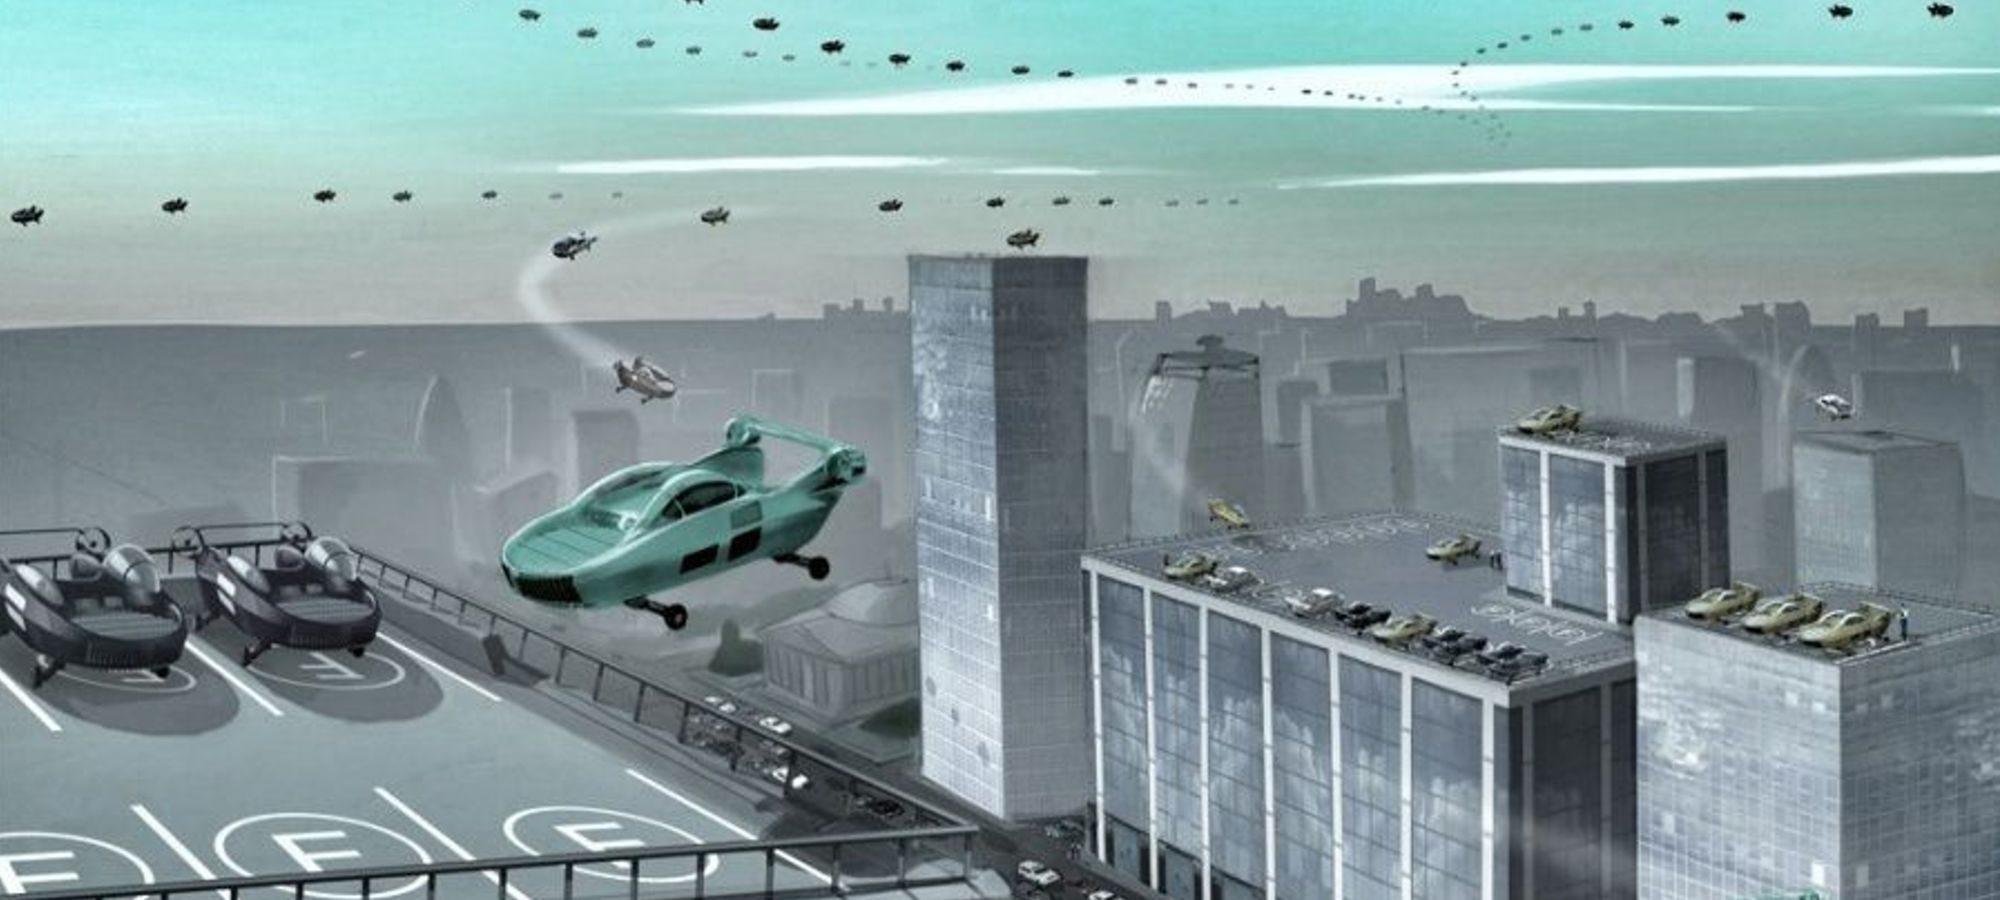 Morgan Stanley Urban Aviation Report